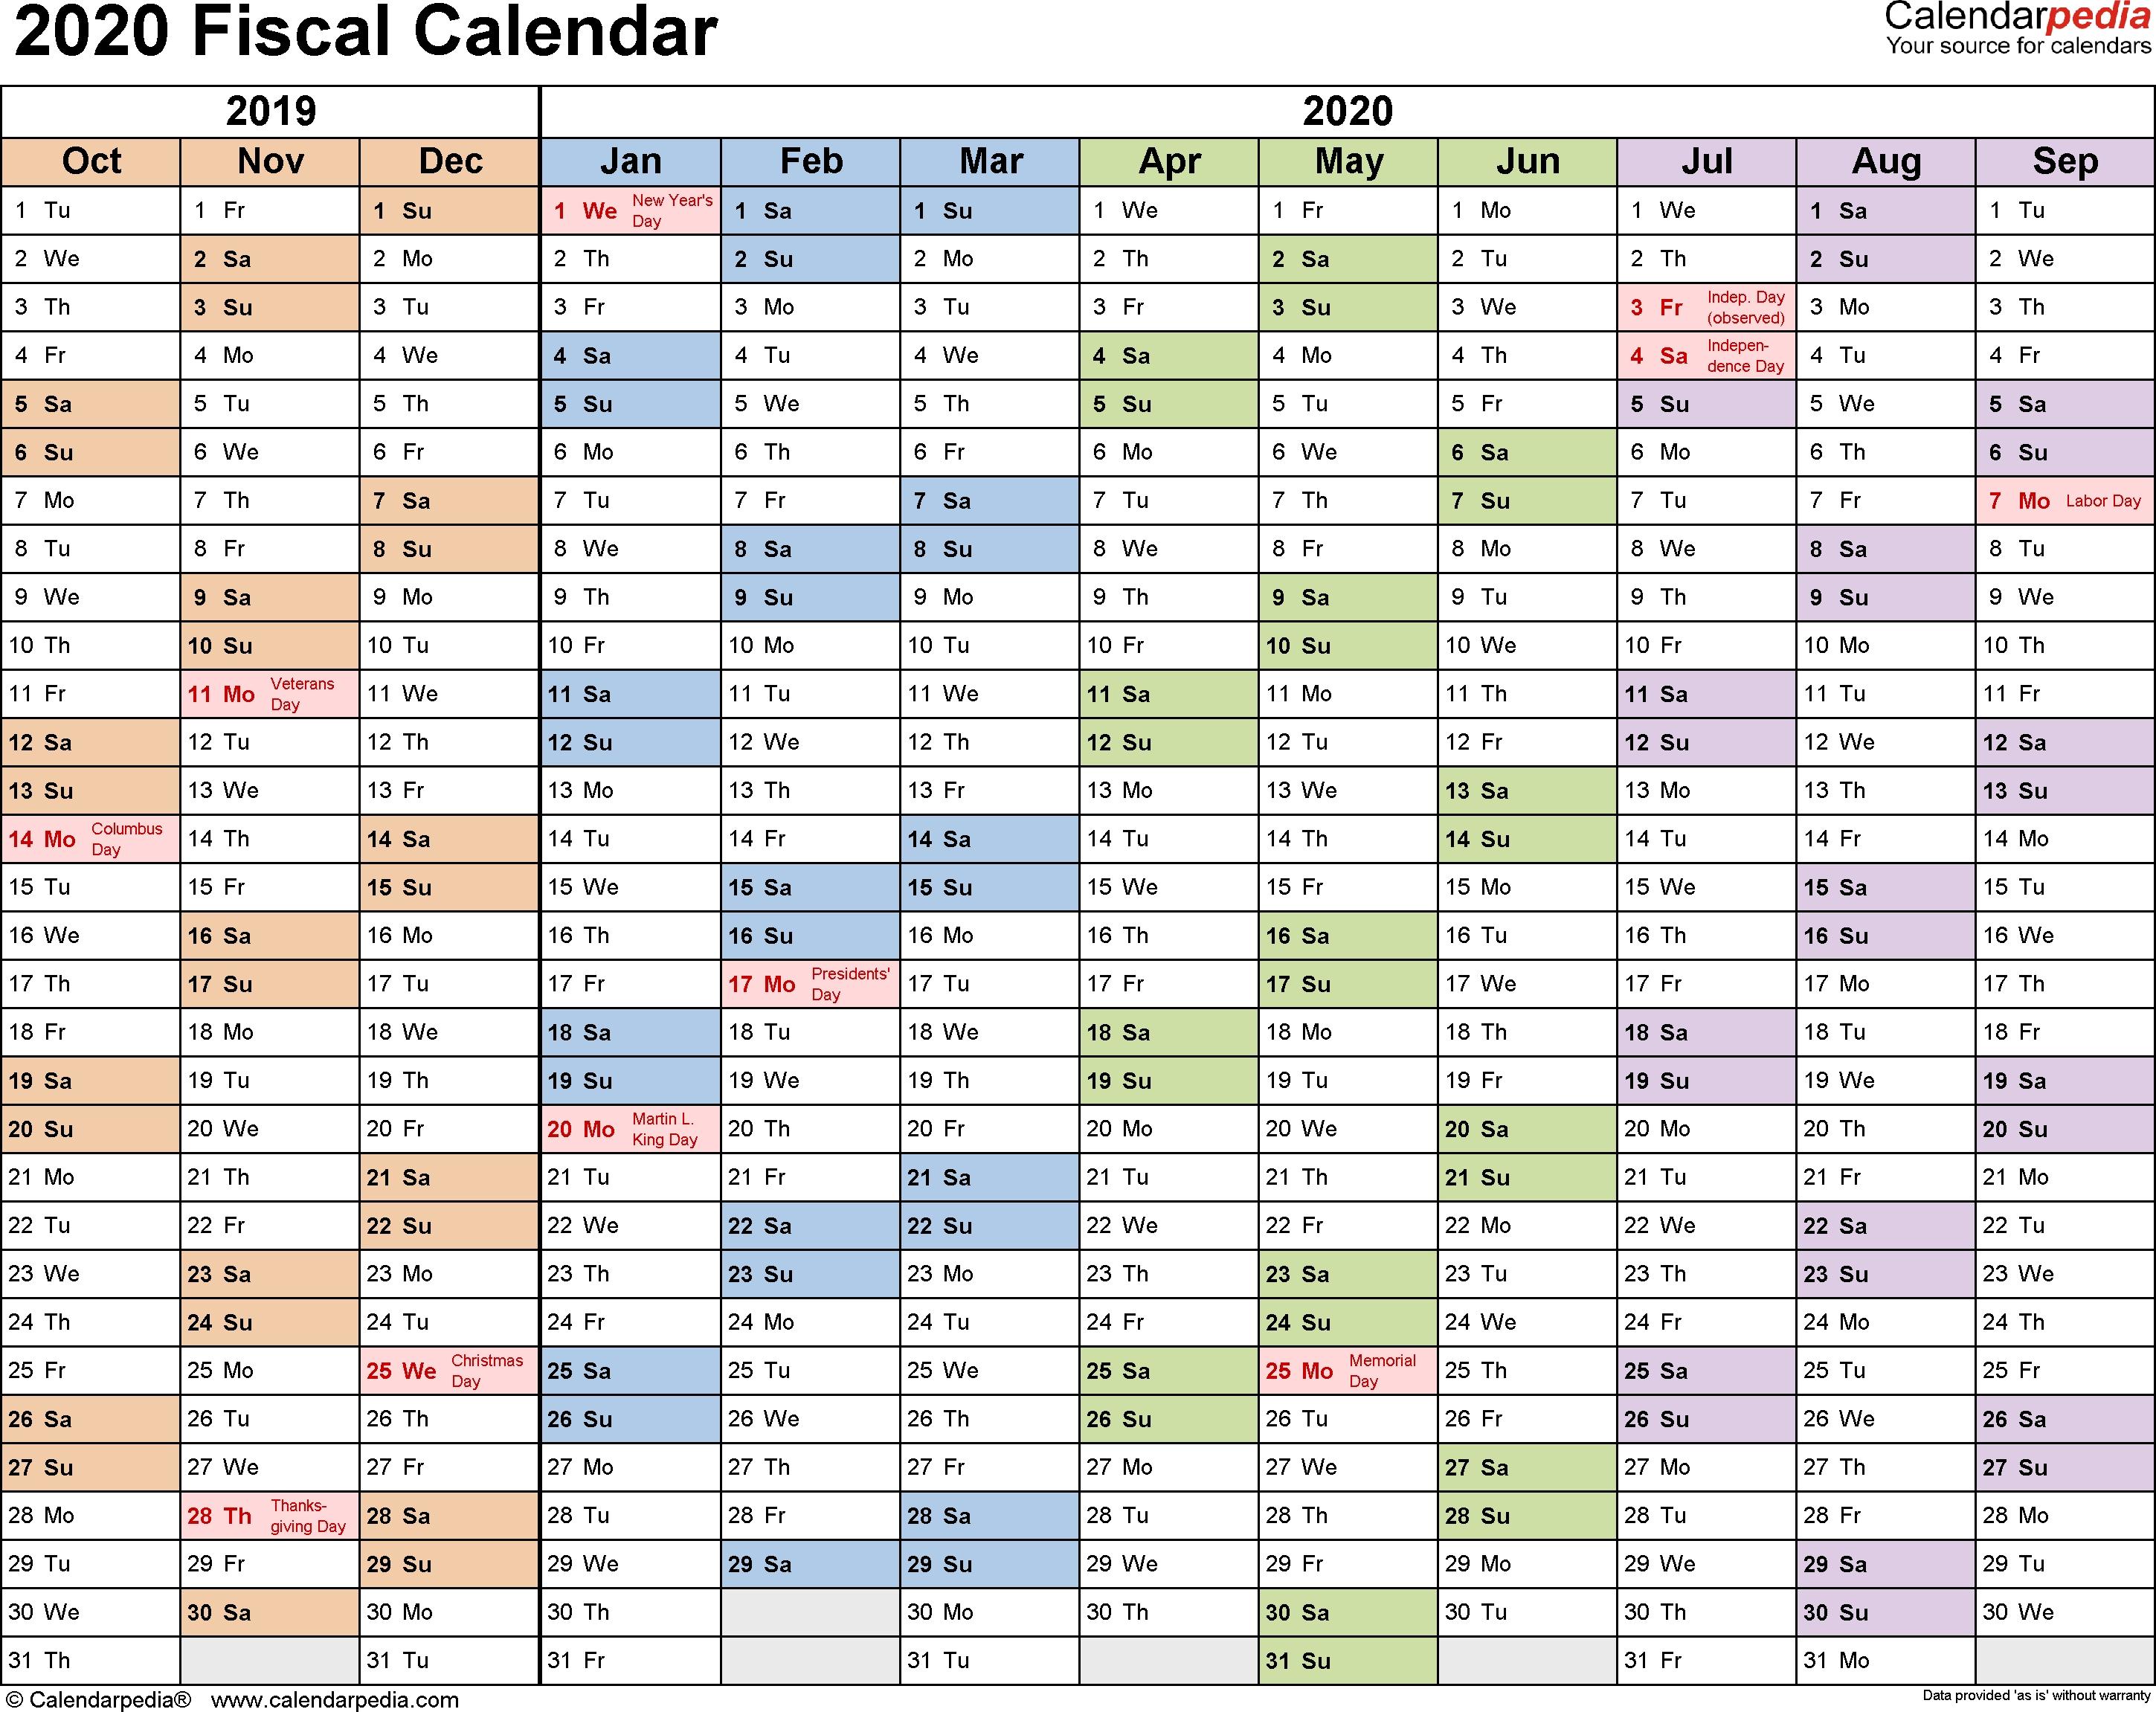 Fiscal Calendars 2020 As Free Printable Pdf Templates pertaining to Financial Week Calendar 2019/2020